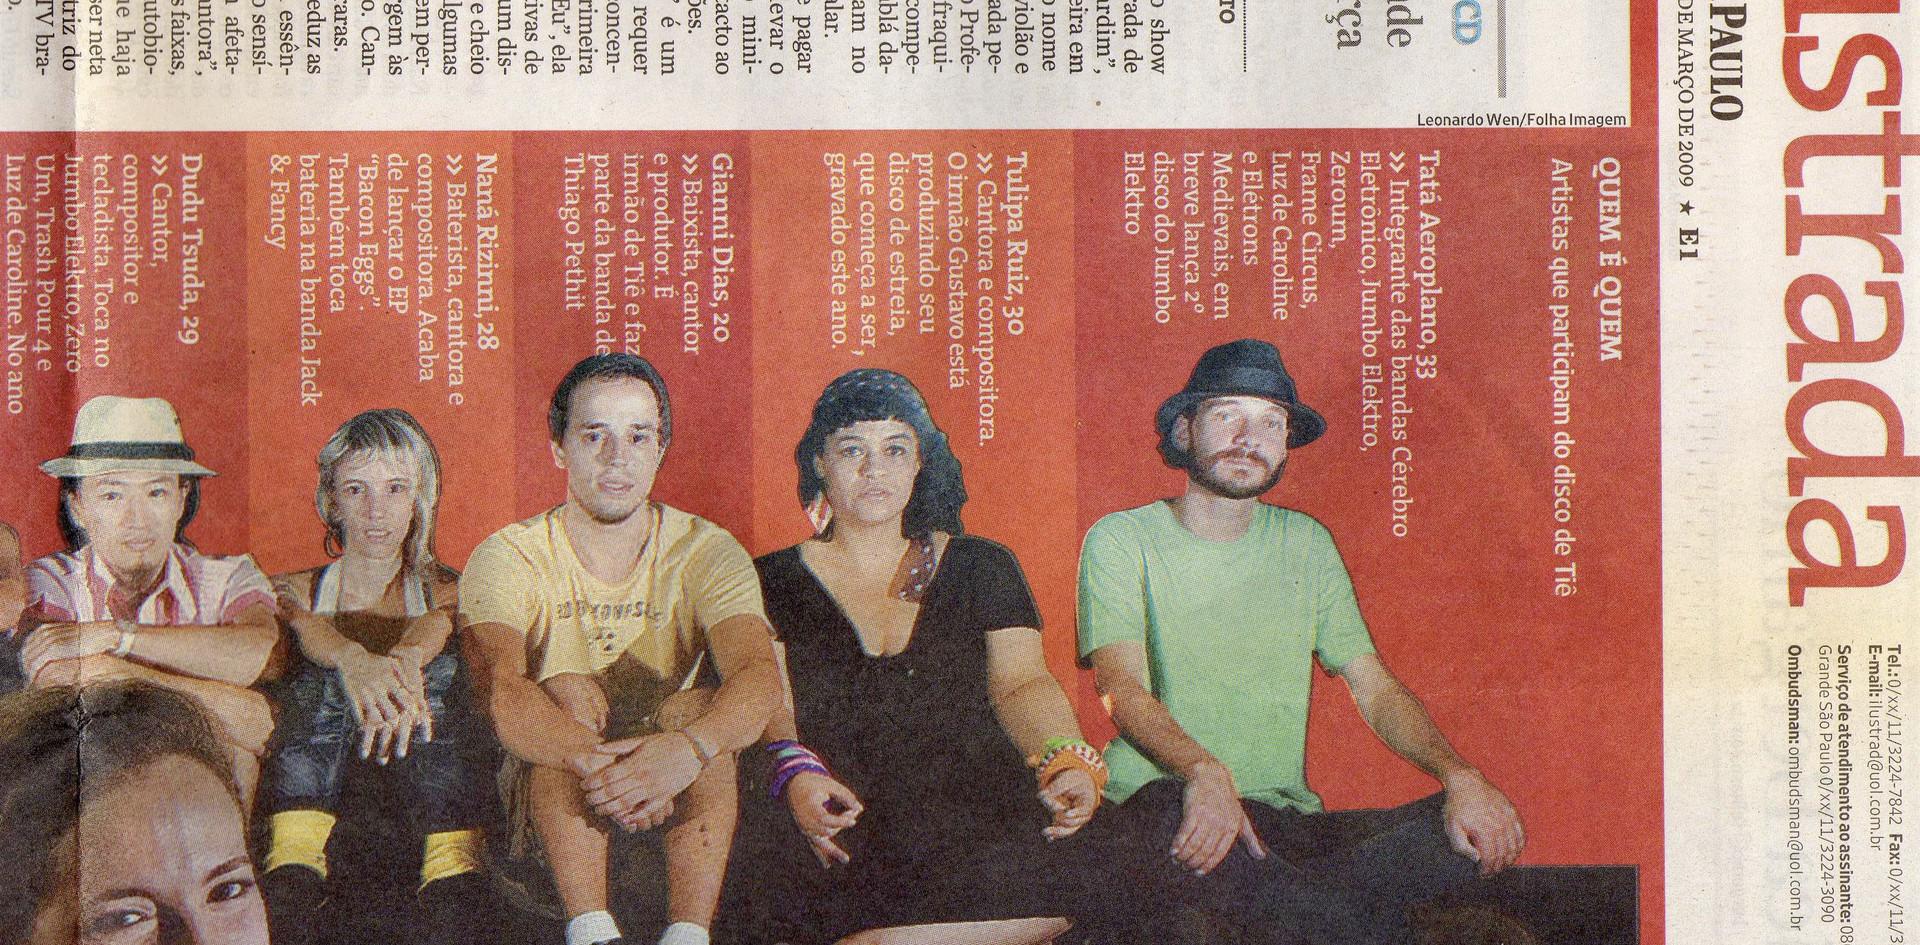 Folha Ilustrada 2009